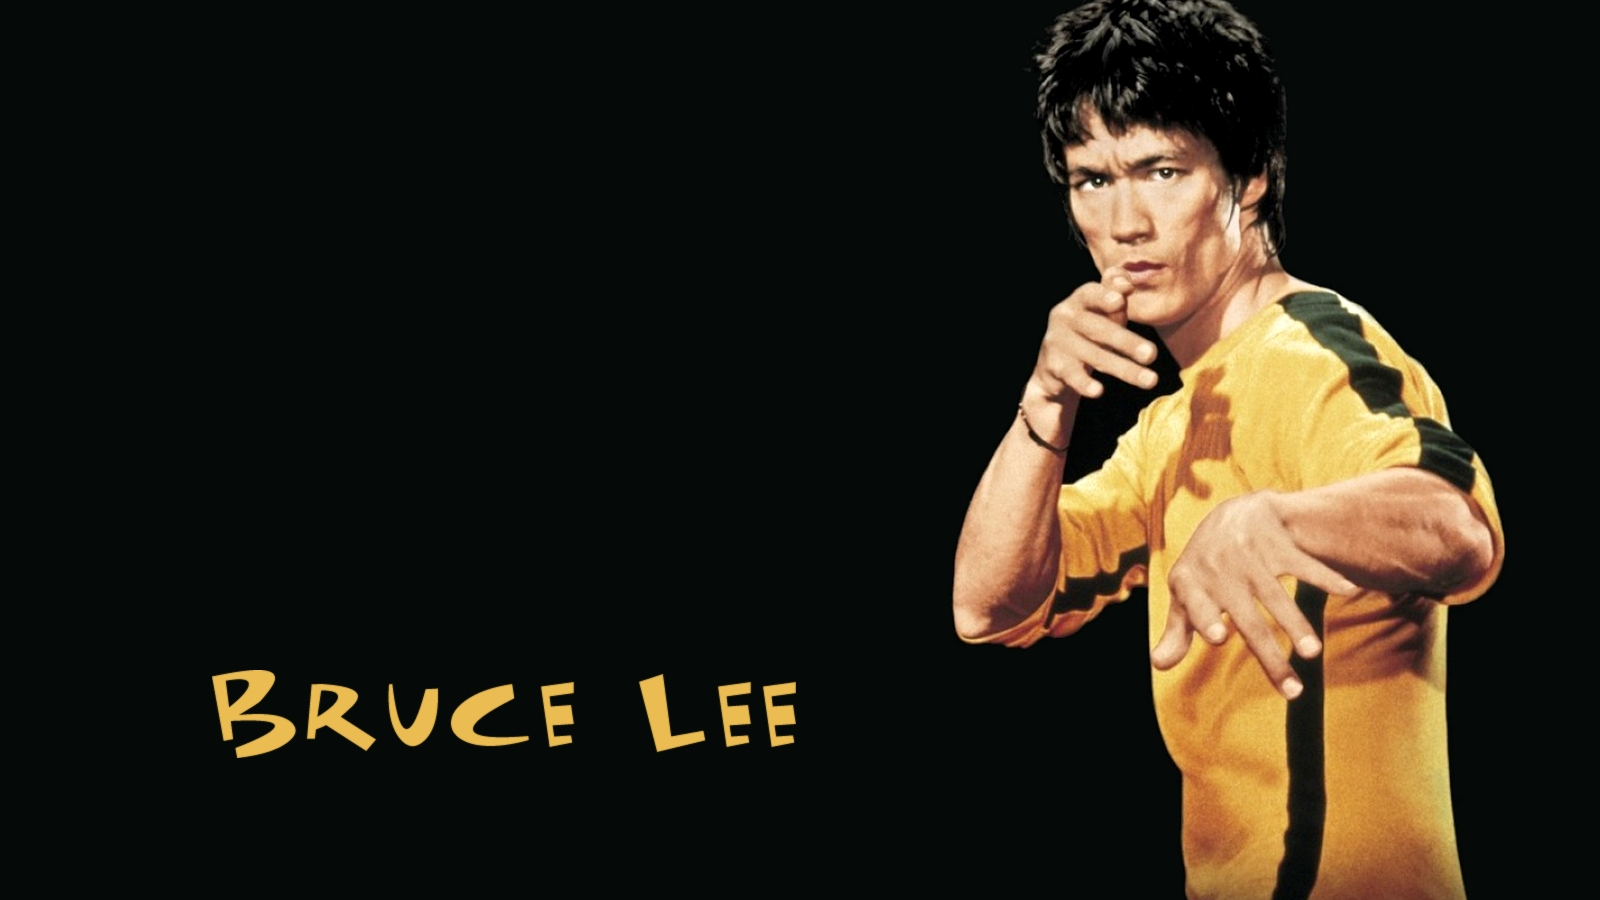 Free Download Bruce Lee Quotes Desktop Wallpaper Quotesgram